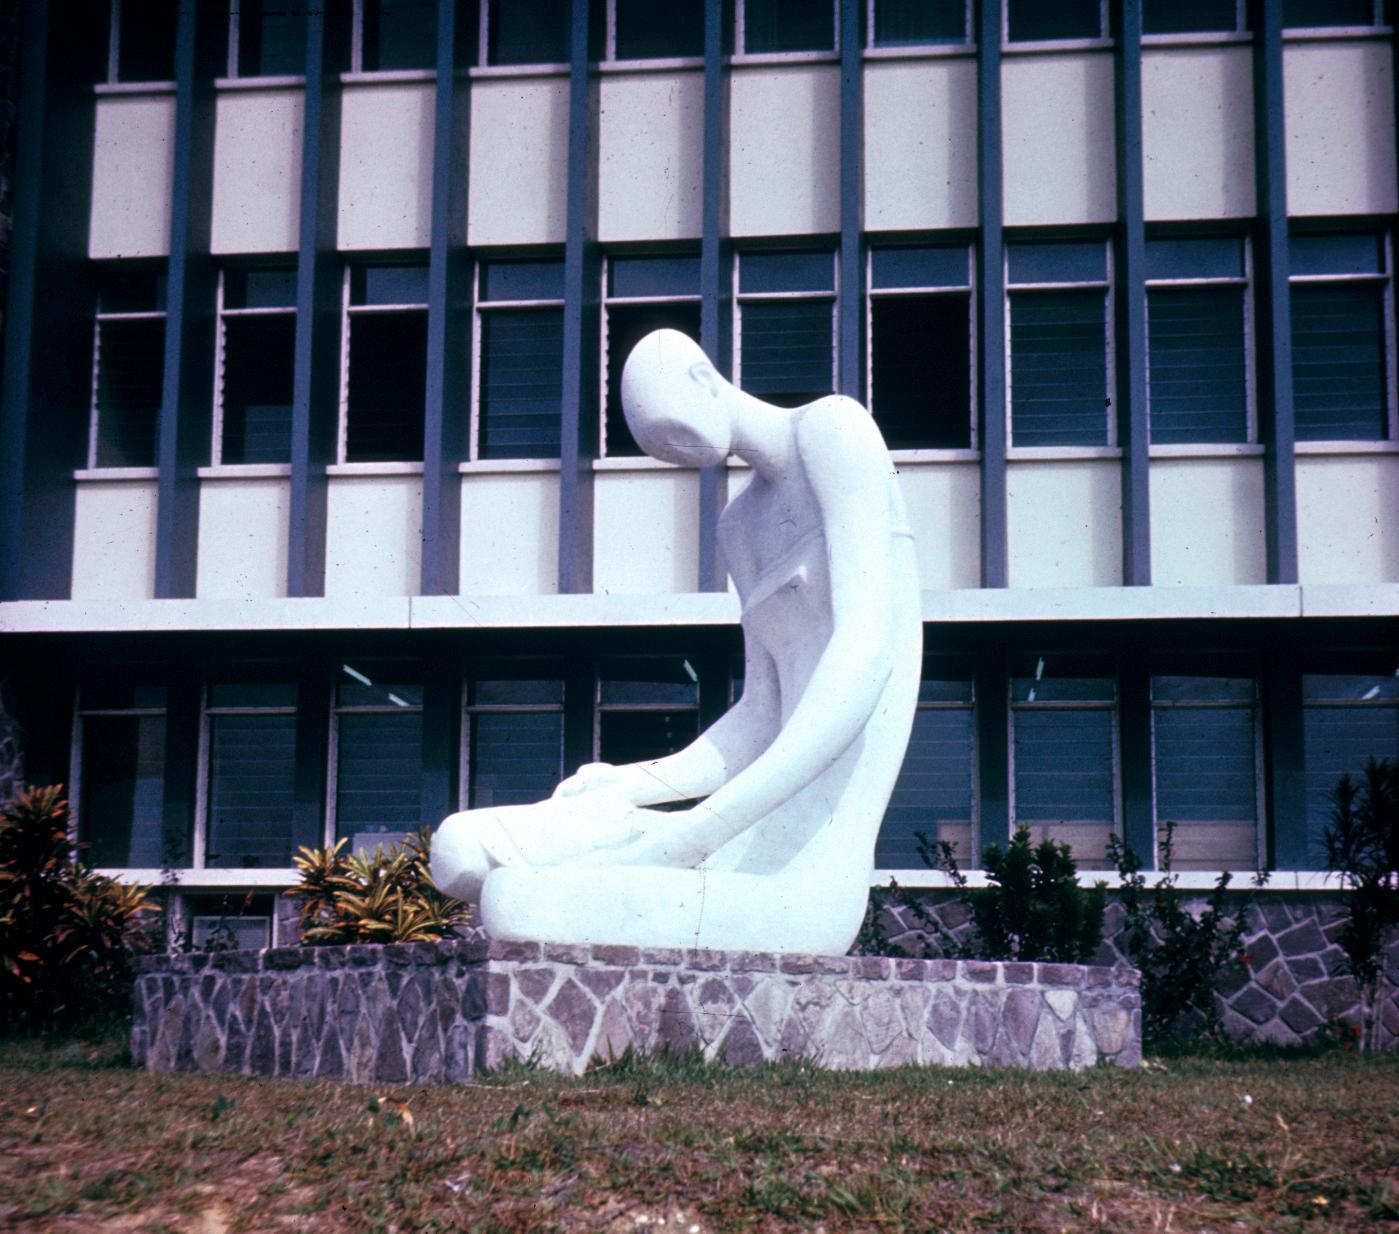 Sculpture on University of Kinshasa Campus